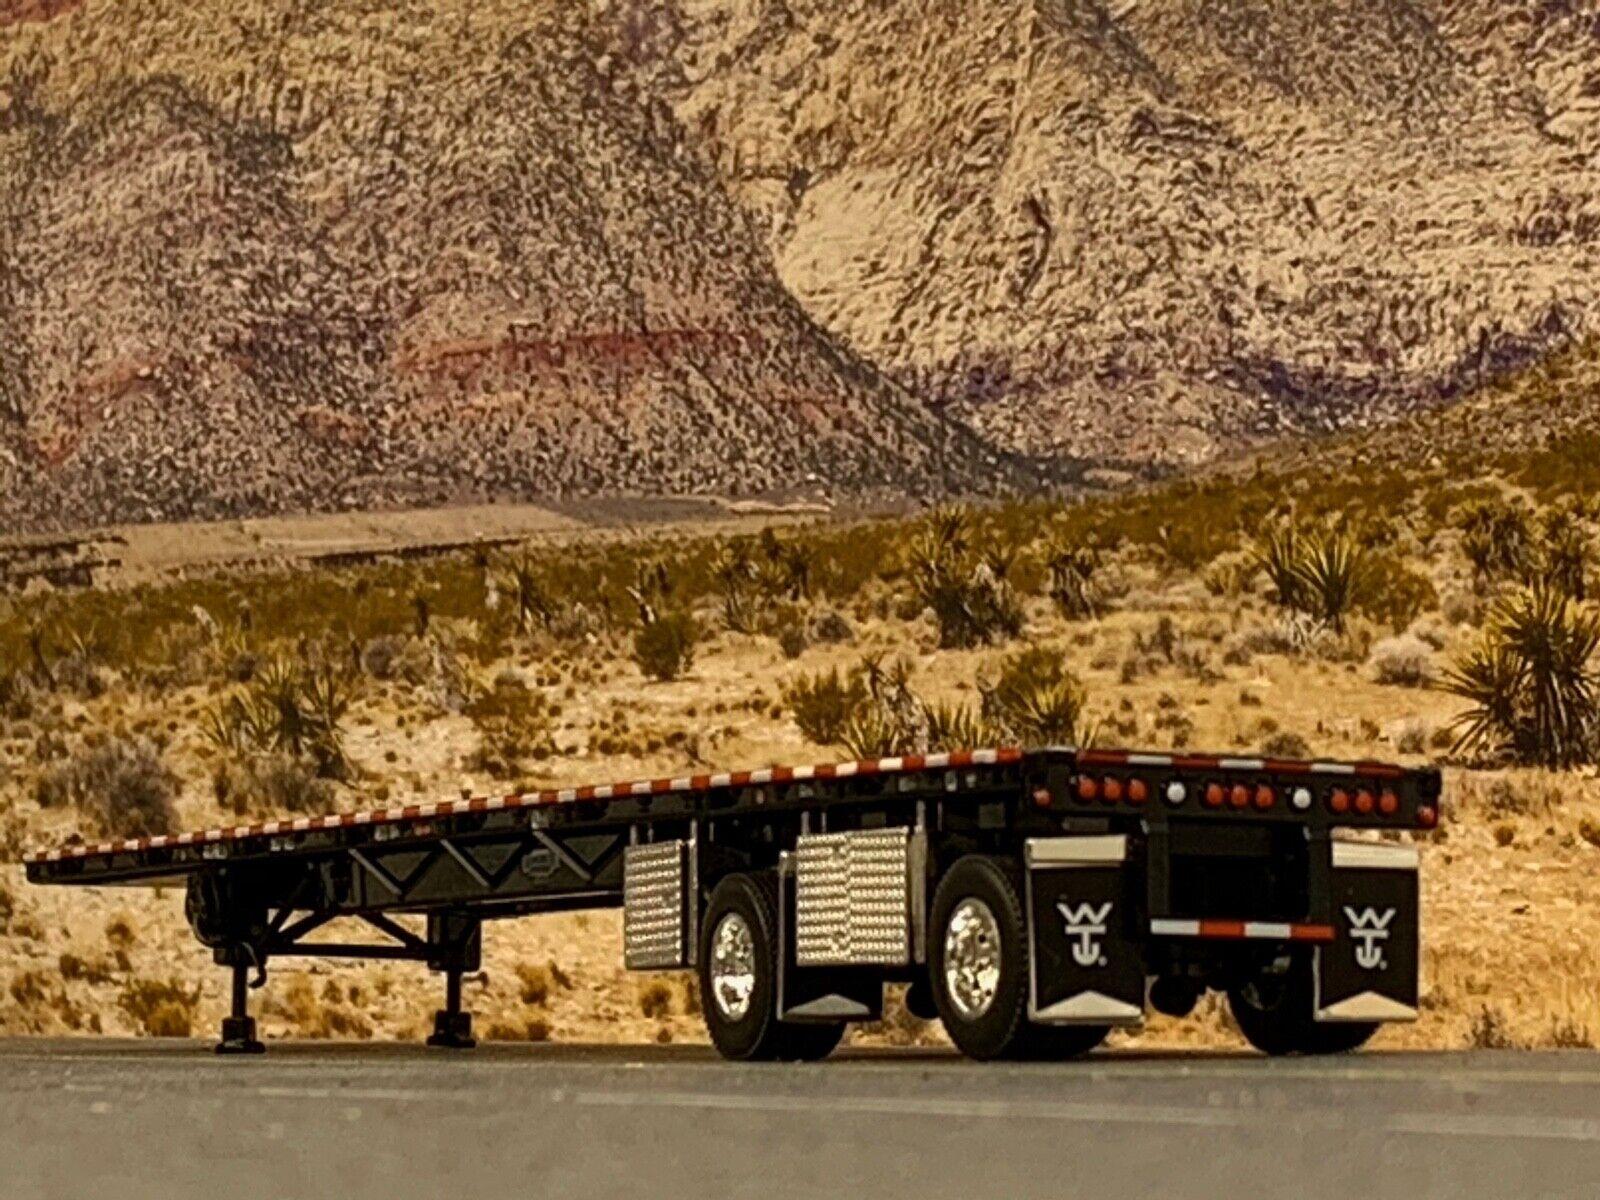 1/64 DCP BLACK WILSON ROADBRUTE SPREAD AXLE FLATBED TRAILER W/ WHEEL & TOOL BOX